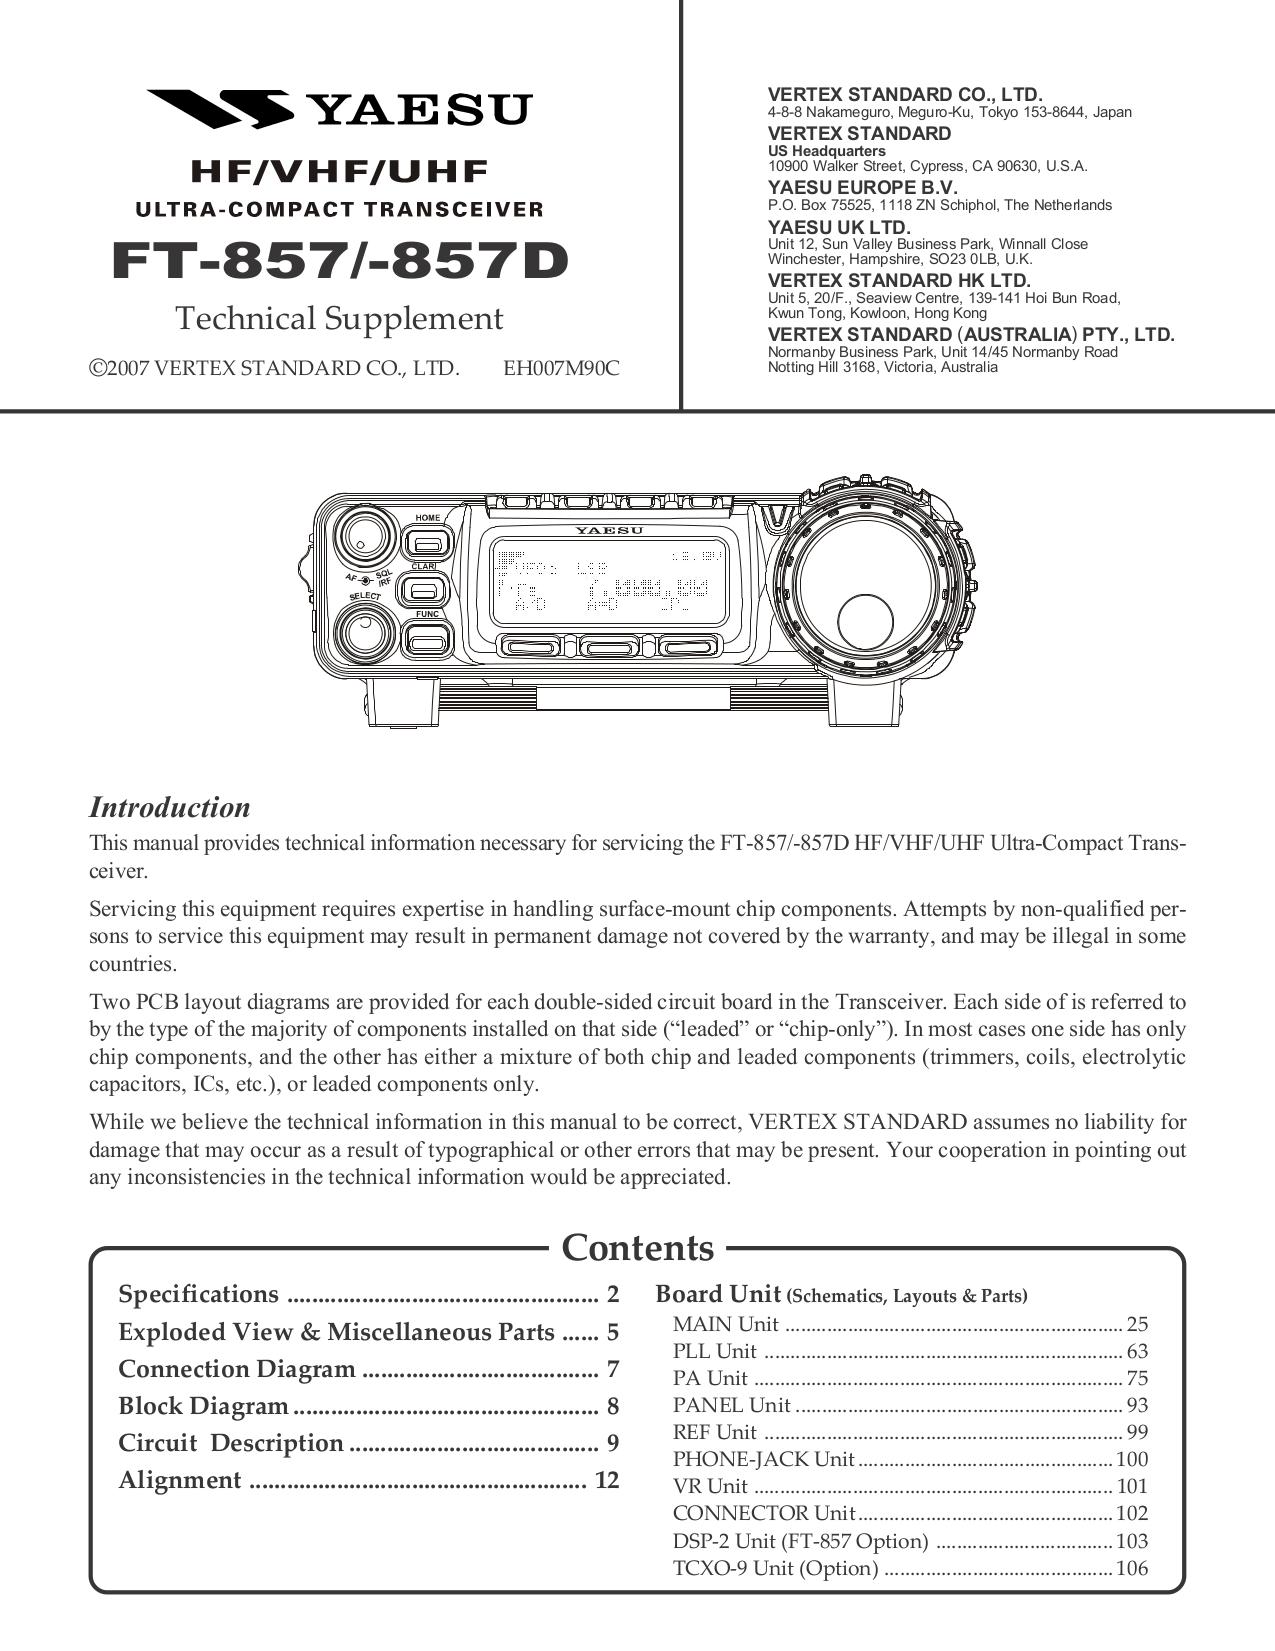 download free pdf for yaesu ft 857d hf transceiver other manual rh umlib com yaesu ft-857d service manual yaesu ft- 857d service manual download